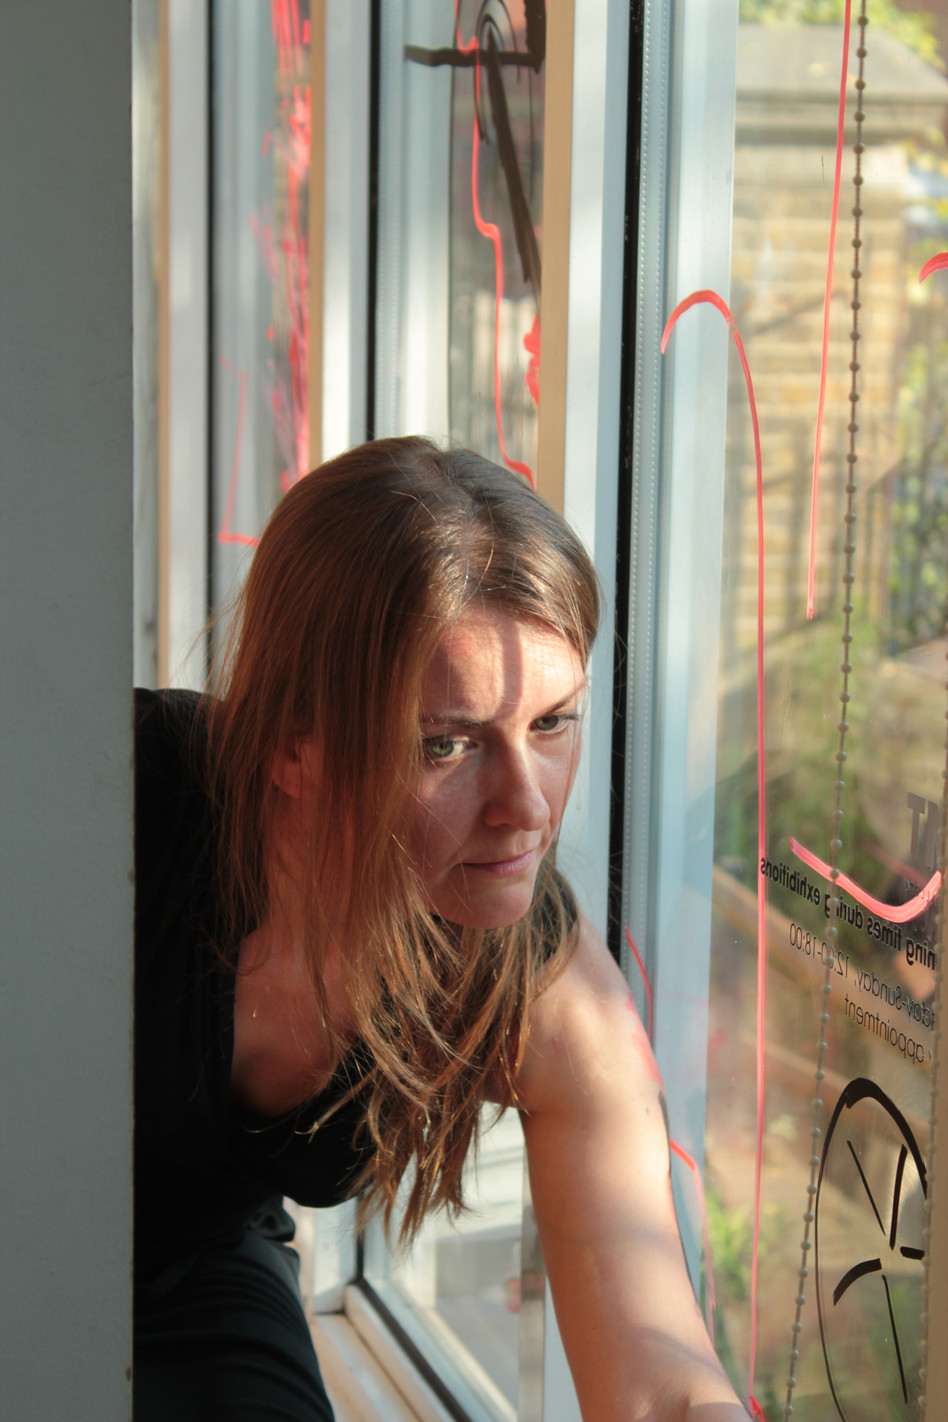 Marina Tsartsara - microcosm // a world within a world